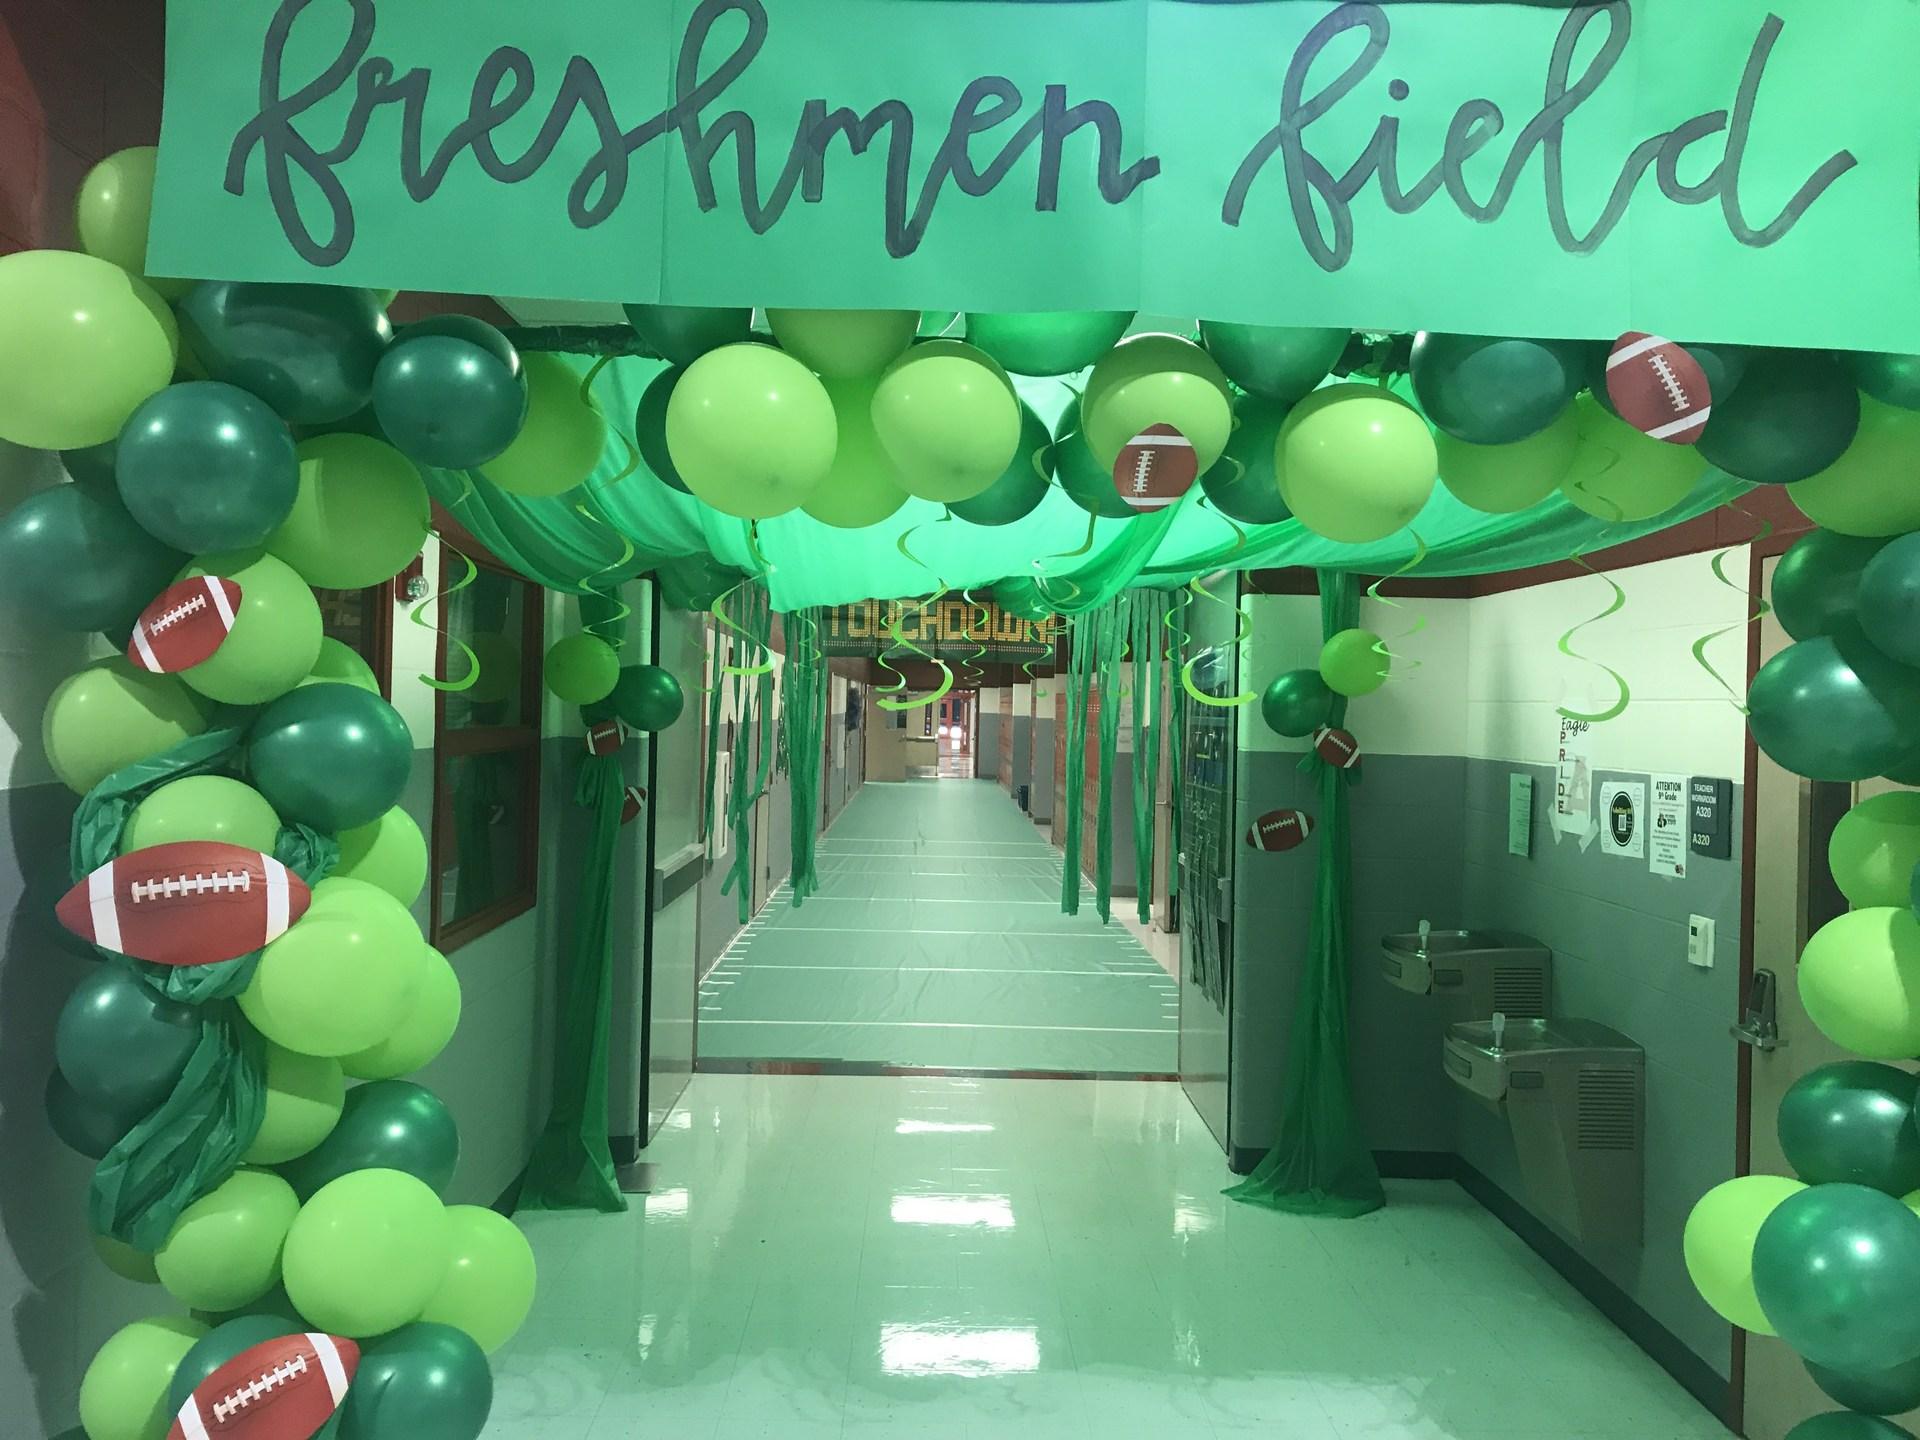 Freshman Hall